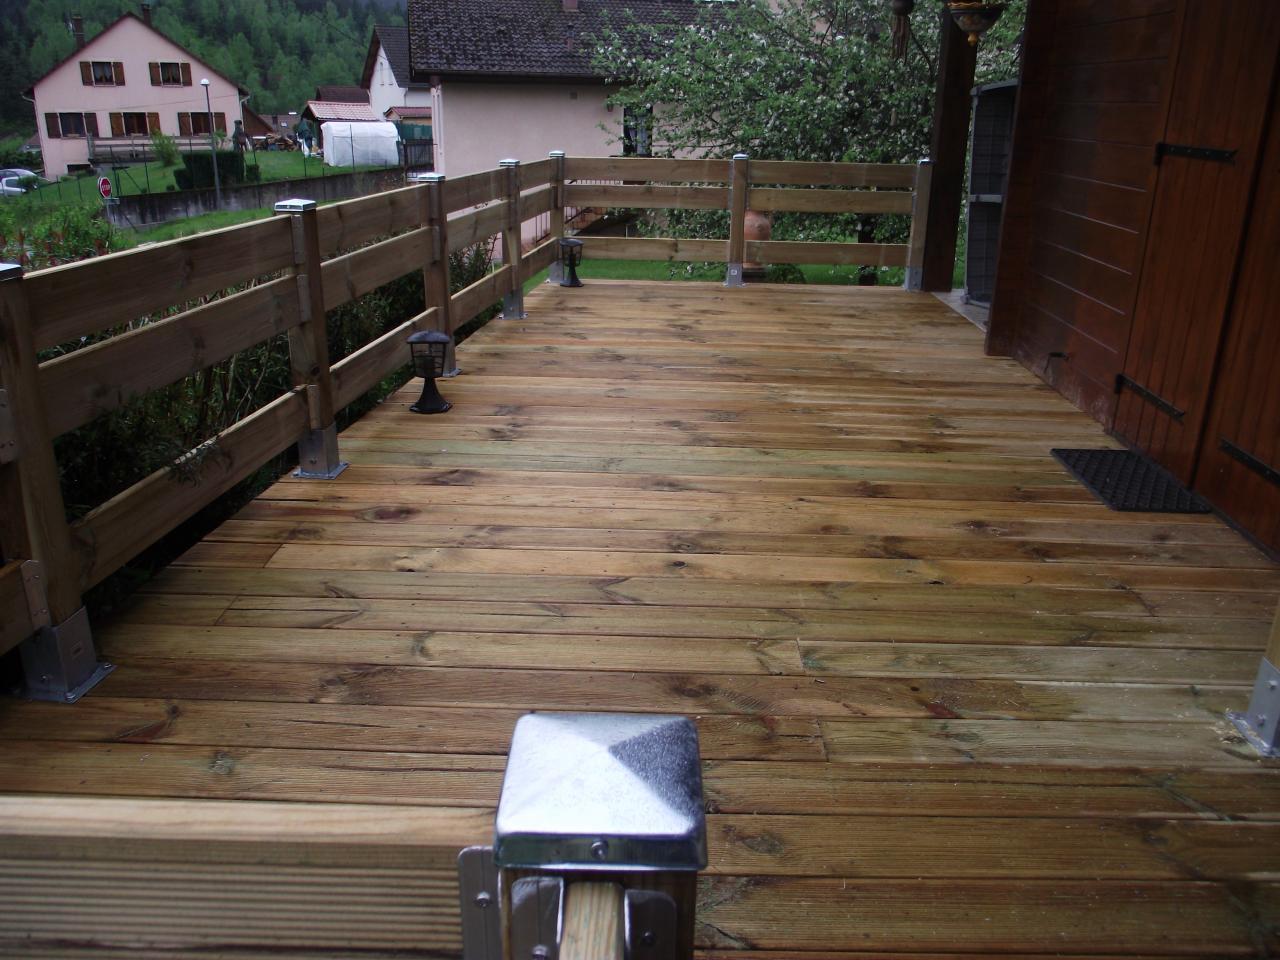 terrasse finie avec entourage bois. Black Bedroom Furniture Sets. Home Design Ideas